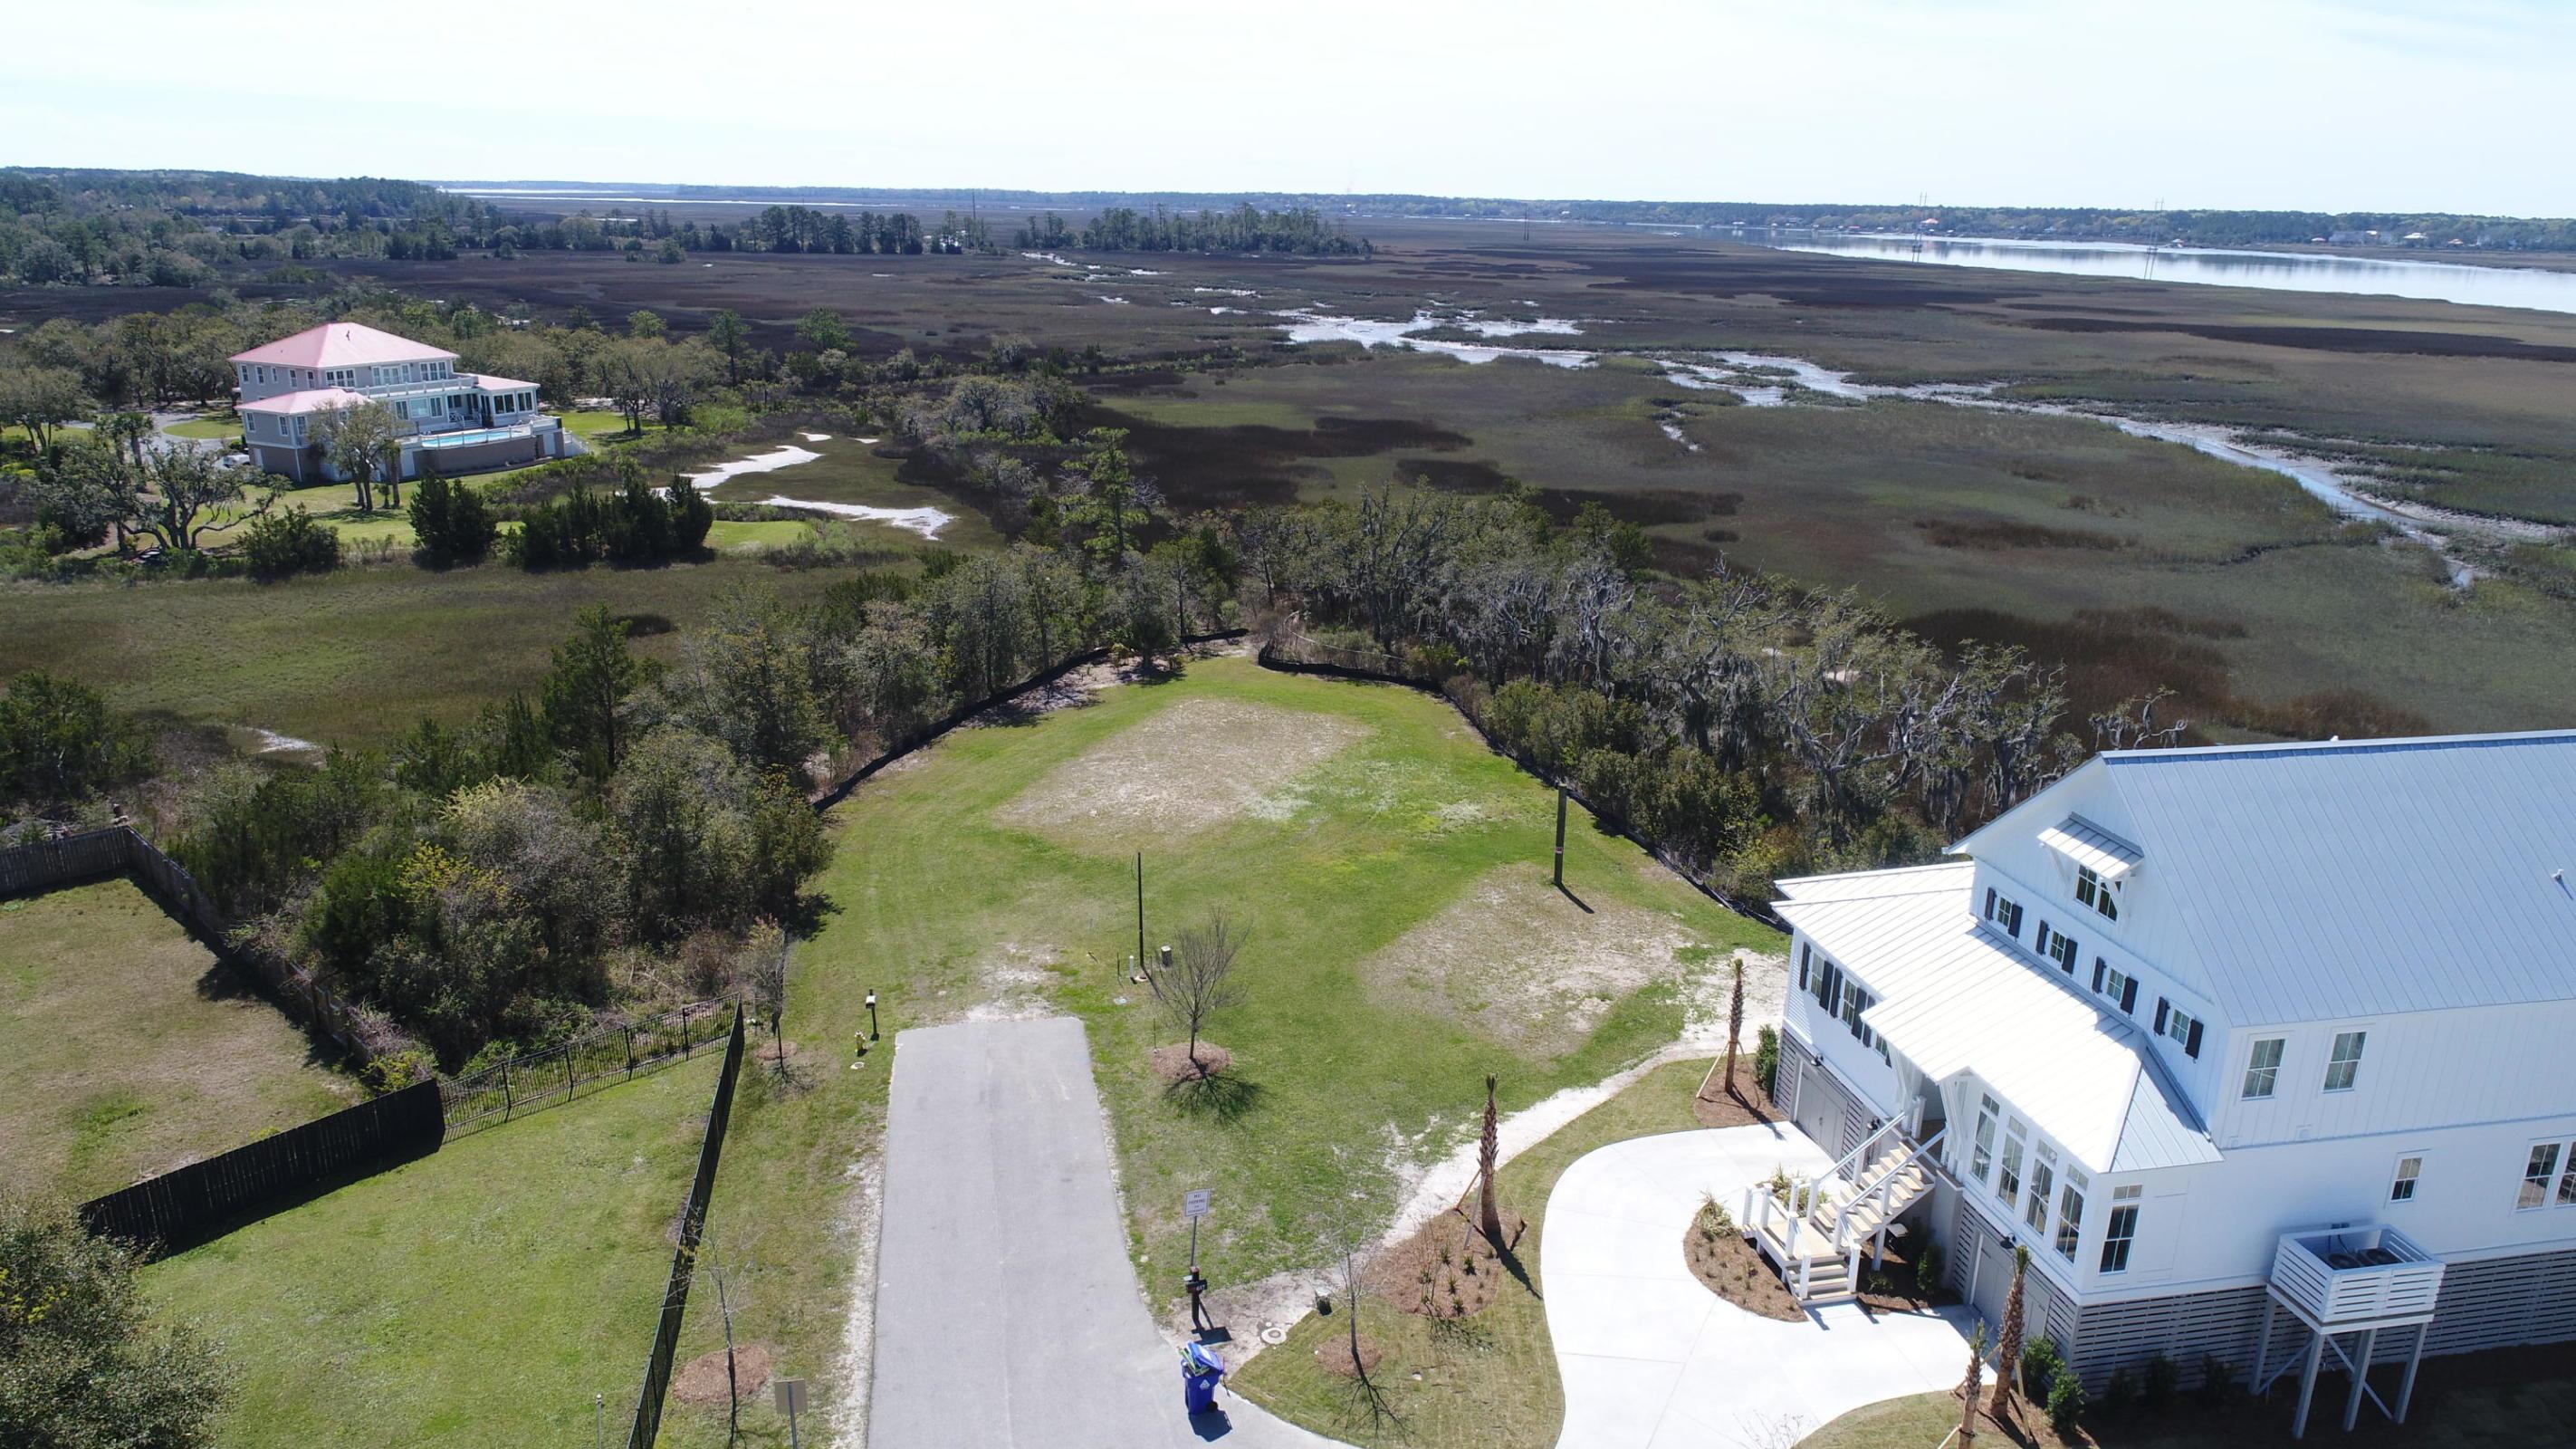 The Pointe At Stono Shores Homes For Sale - 621 Stono Shores Point, Charleston, SC - 64